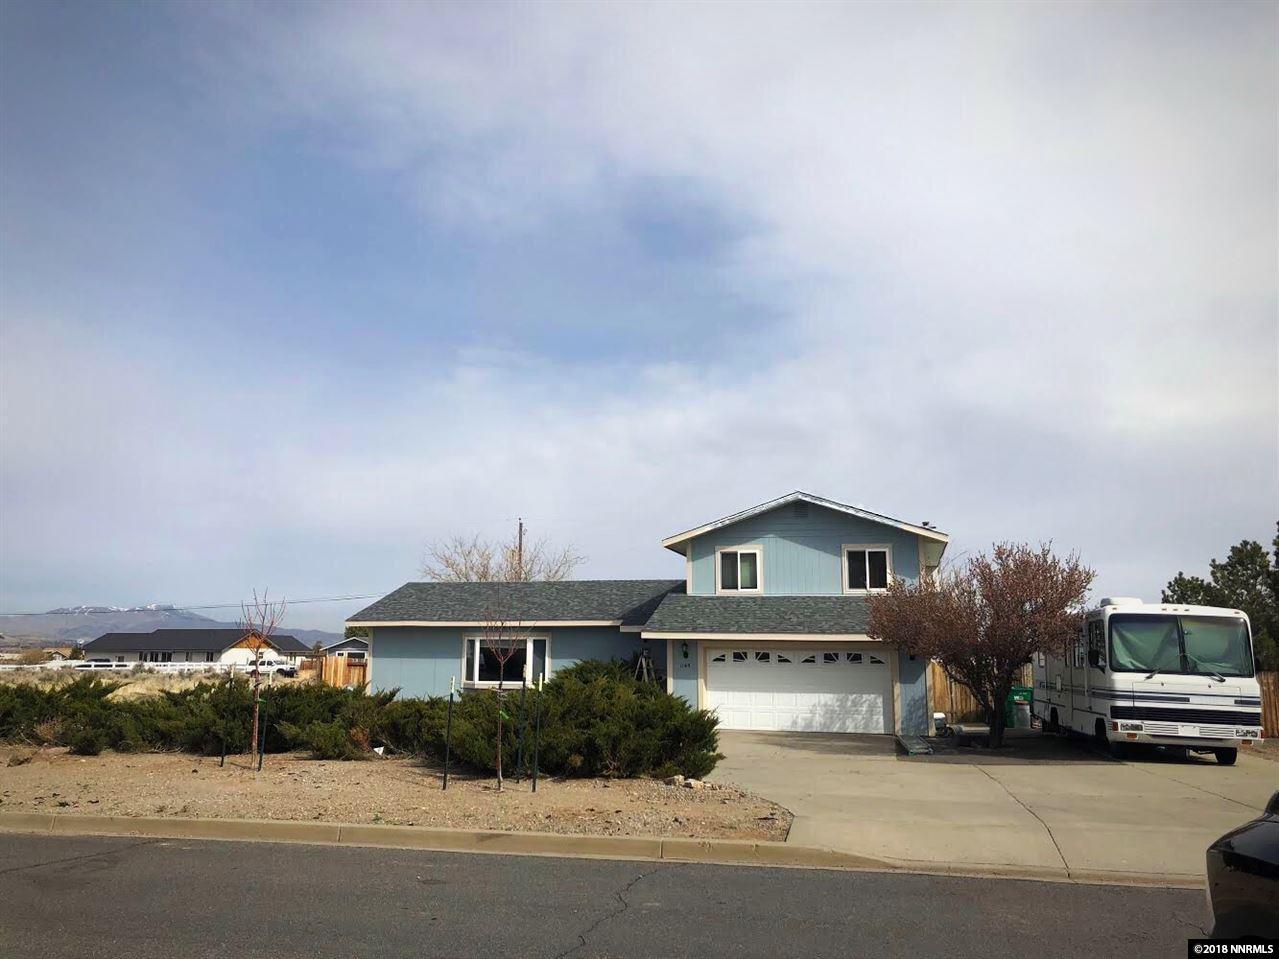 Image for 1145 Lavender Way, Reno, NV 89521